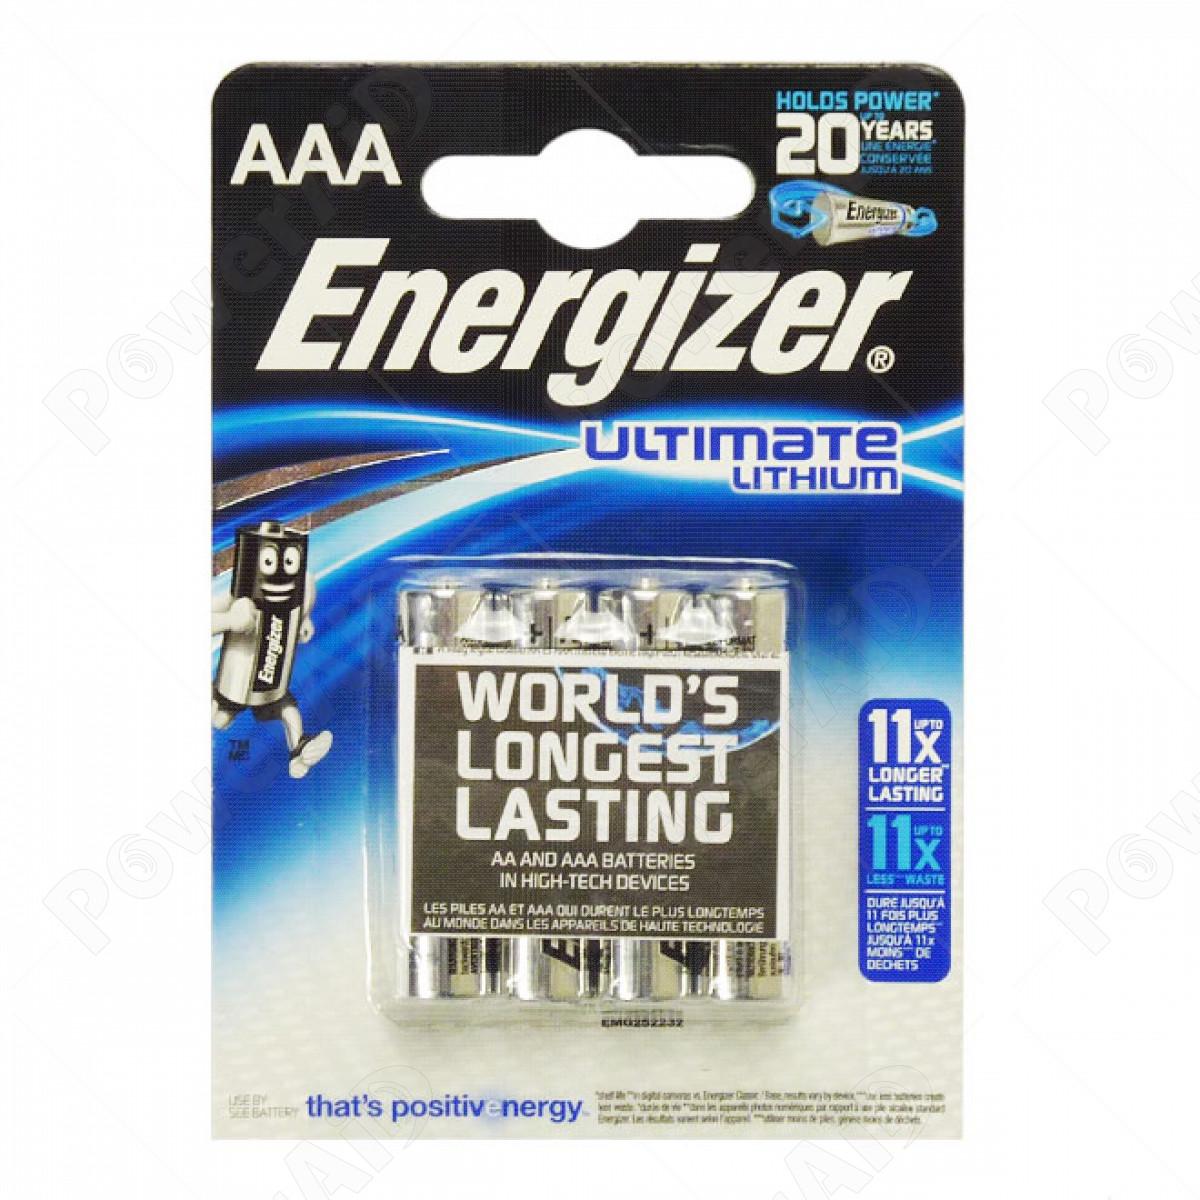 Energizer - Ministilo AAA Ultimate Lithium